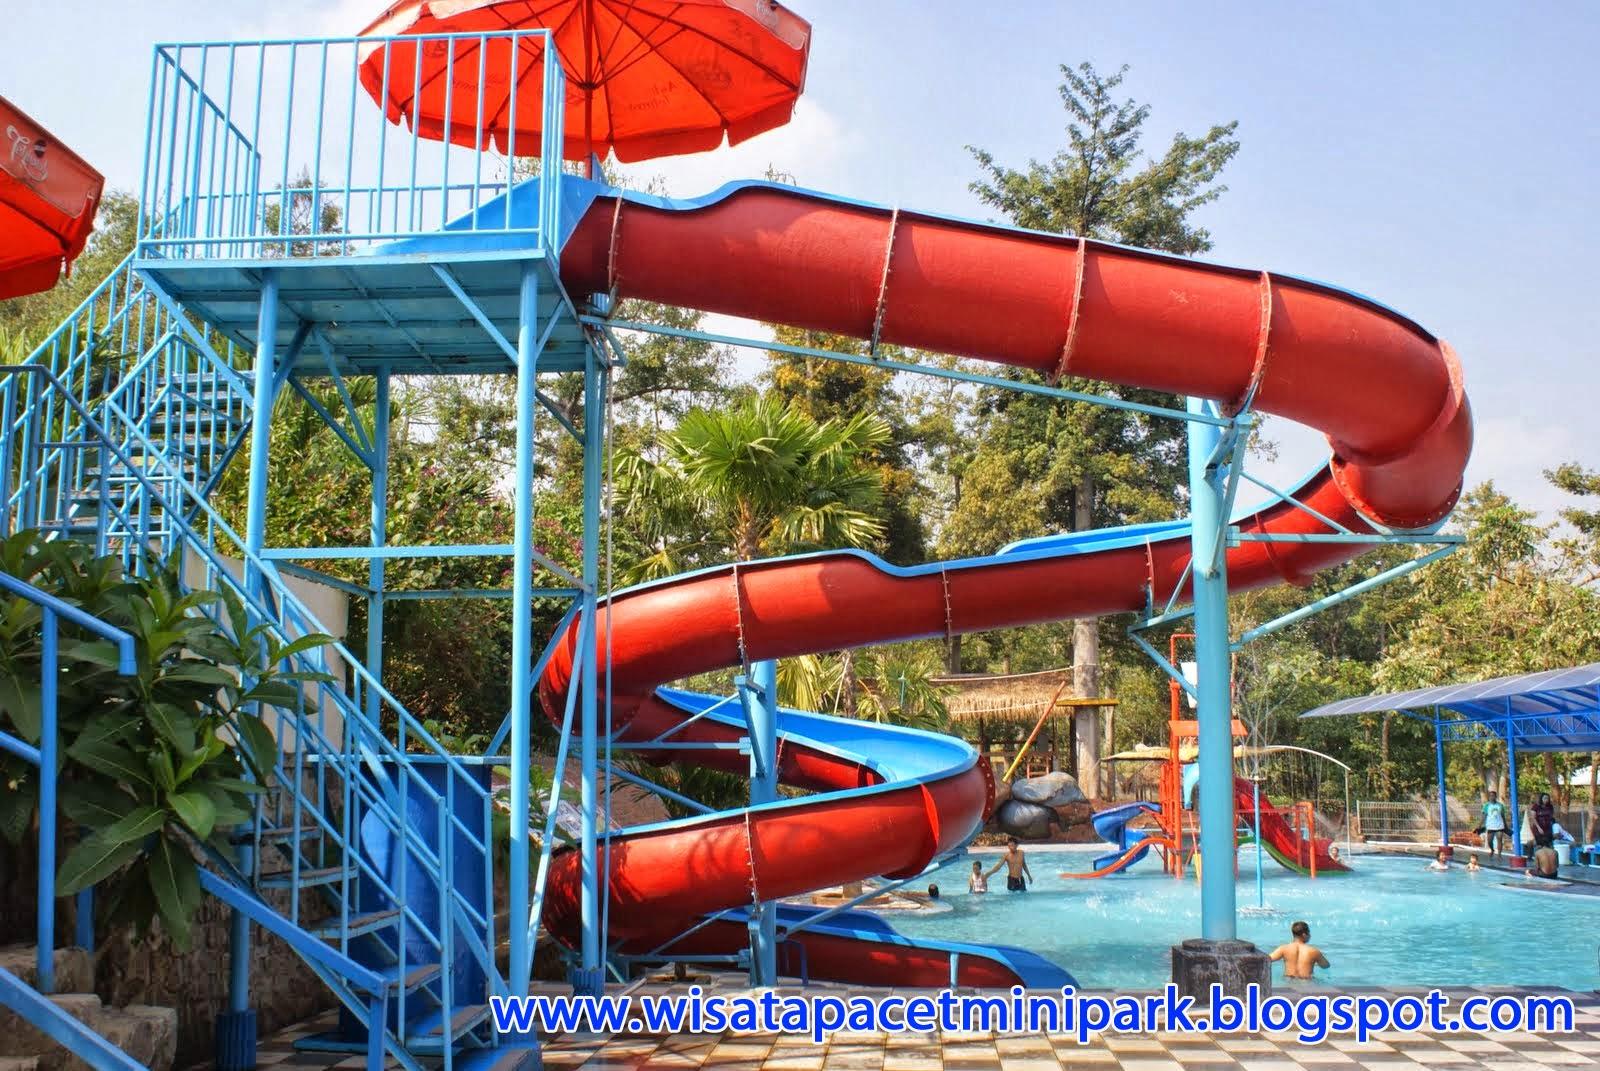 Pacet Mini Park Wahana Rekreasi Www Wisatapacetminipark Blogspot 082231080521 Taman